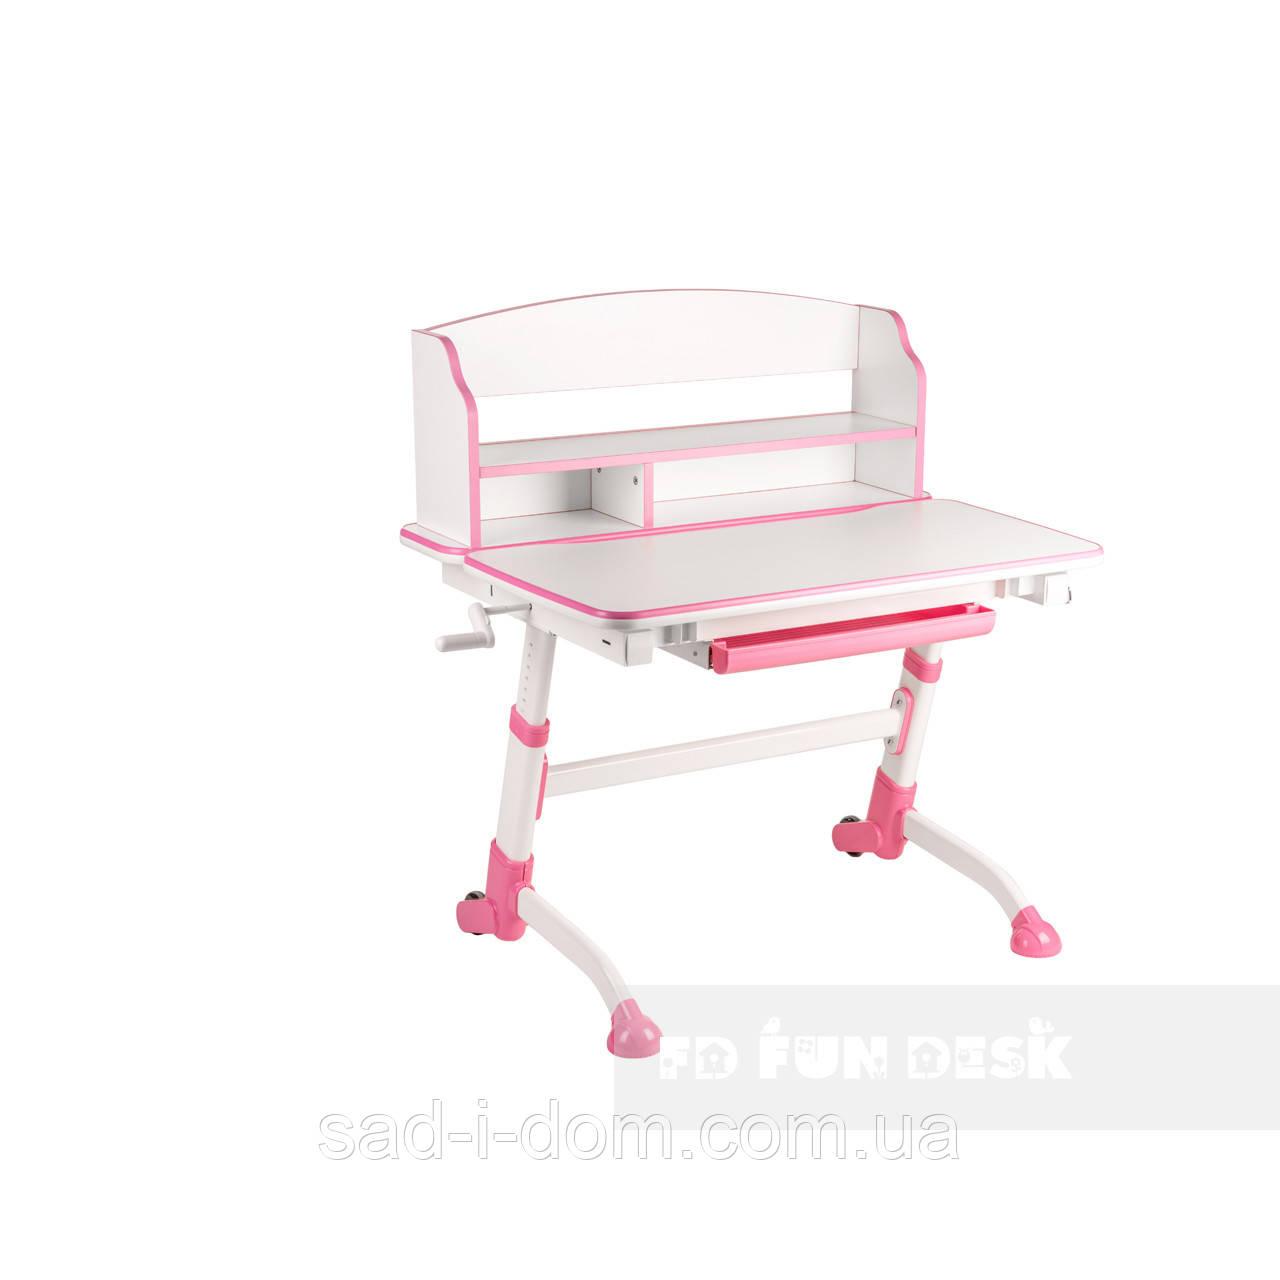 Растущая парта для школьника FunDesk Volare II, розовая